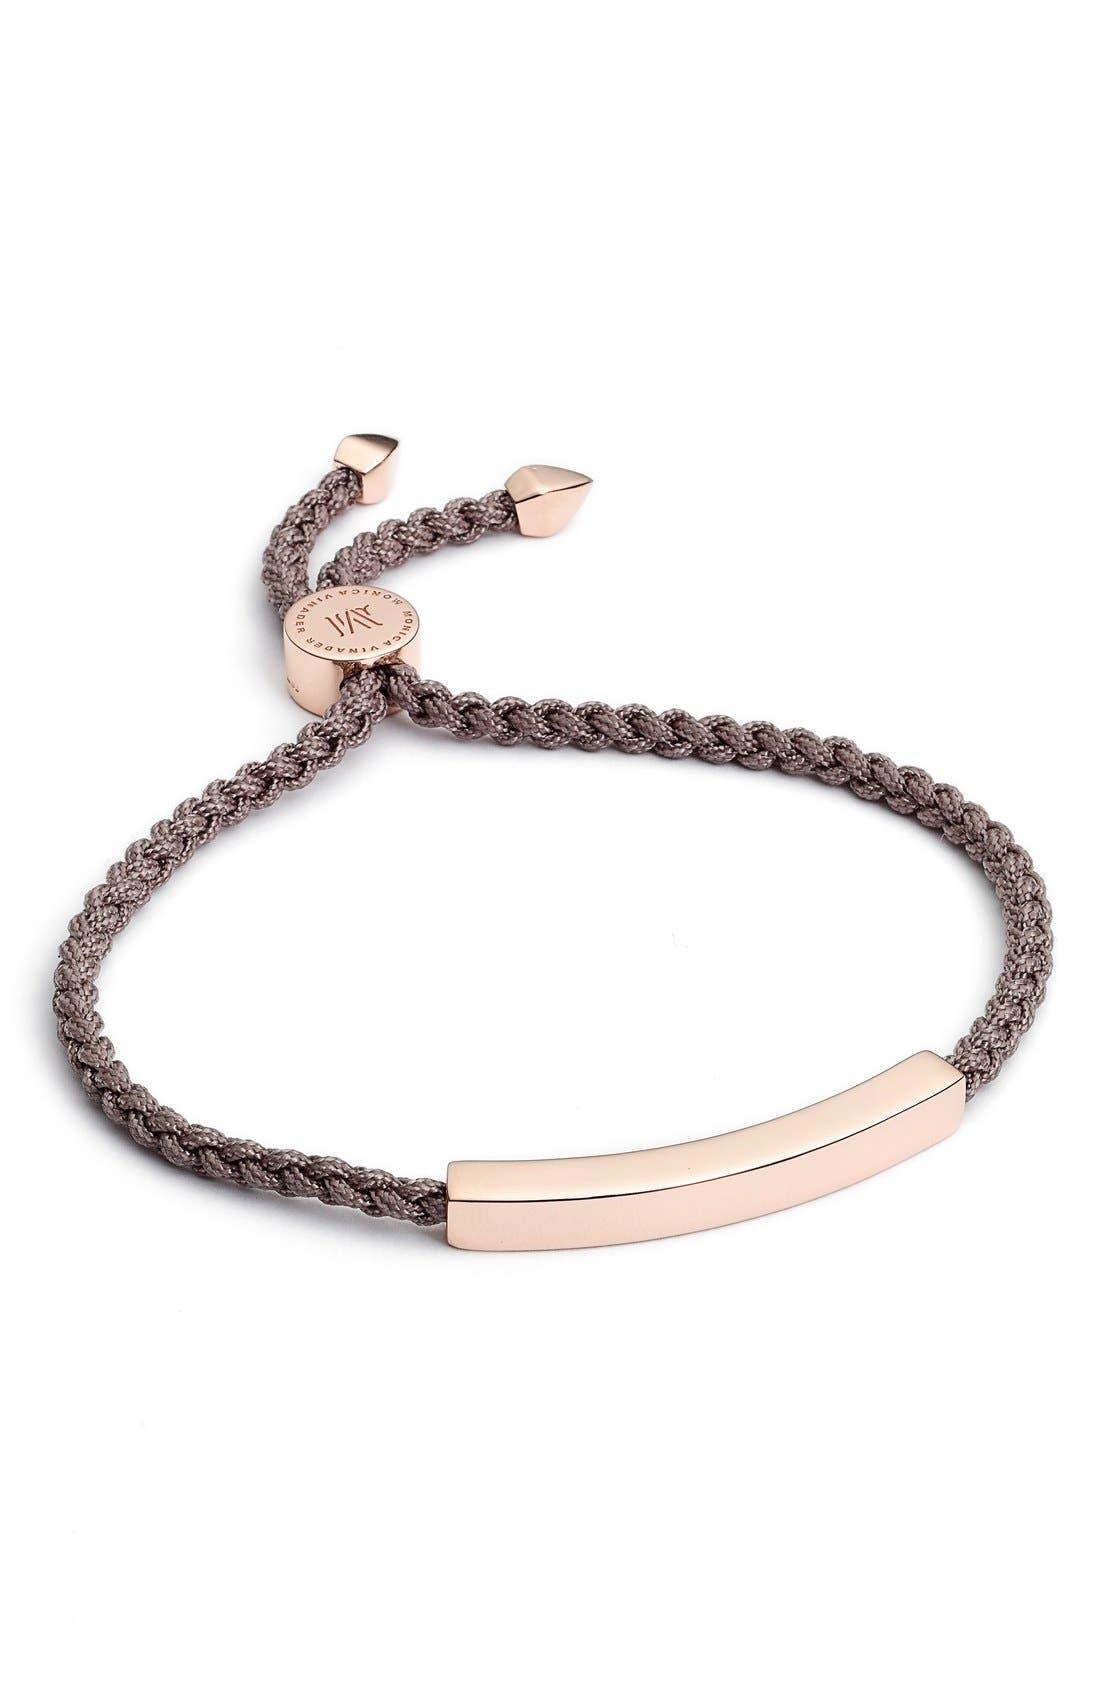 Main Image - Monica Vinader Linear Friendship Bracelet